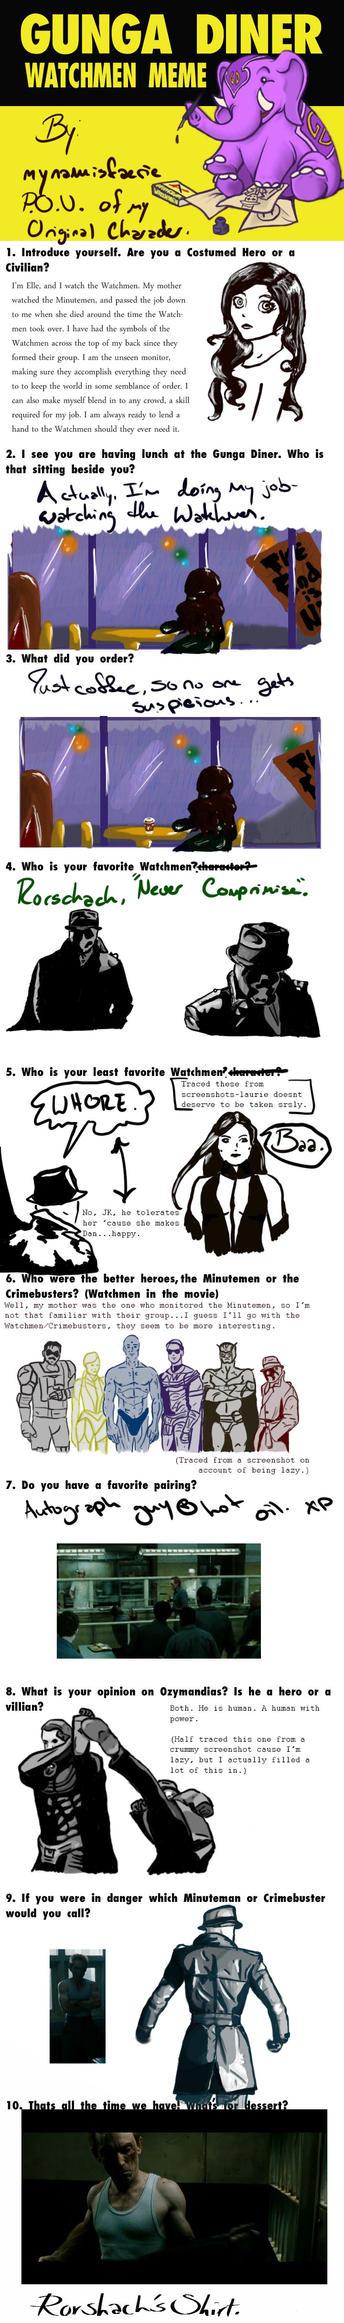 Watchmen Meme by mynameisfaerie